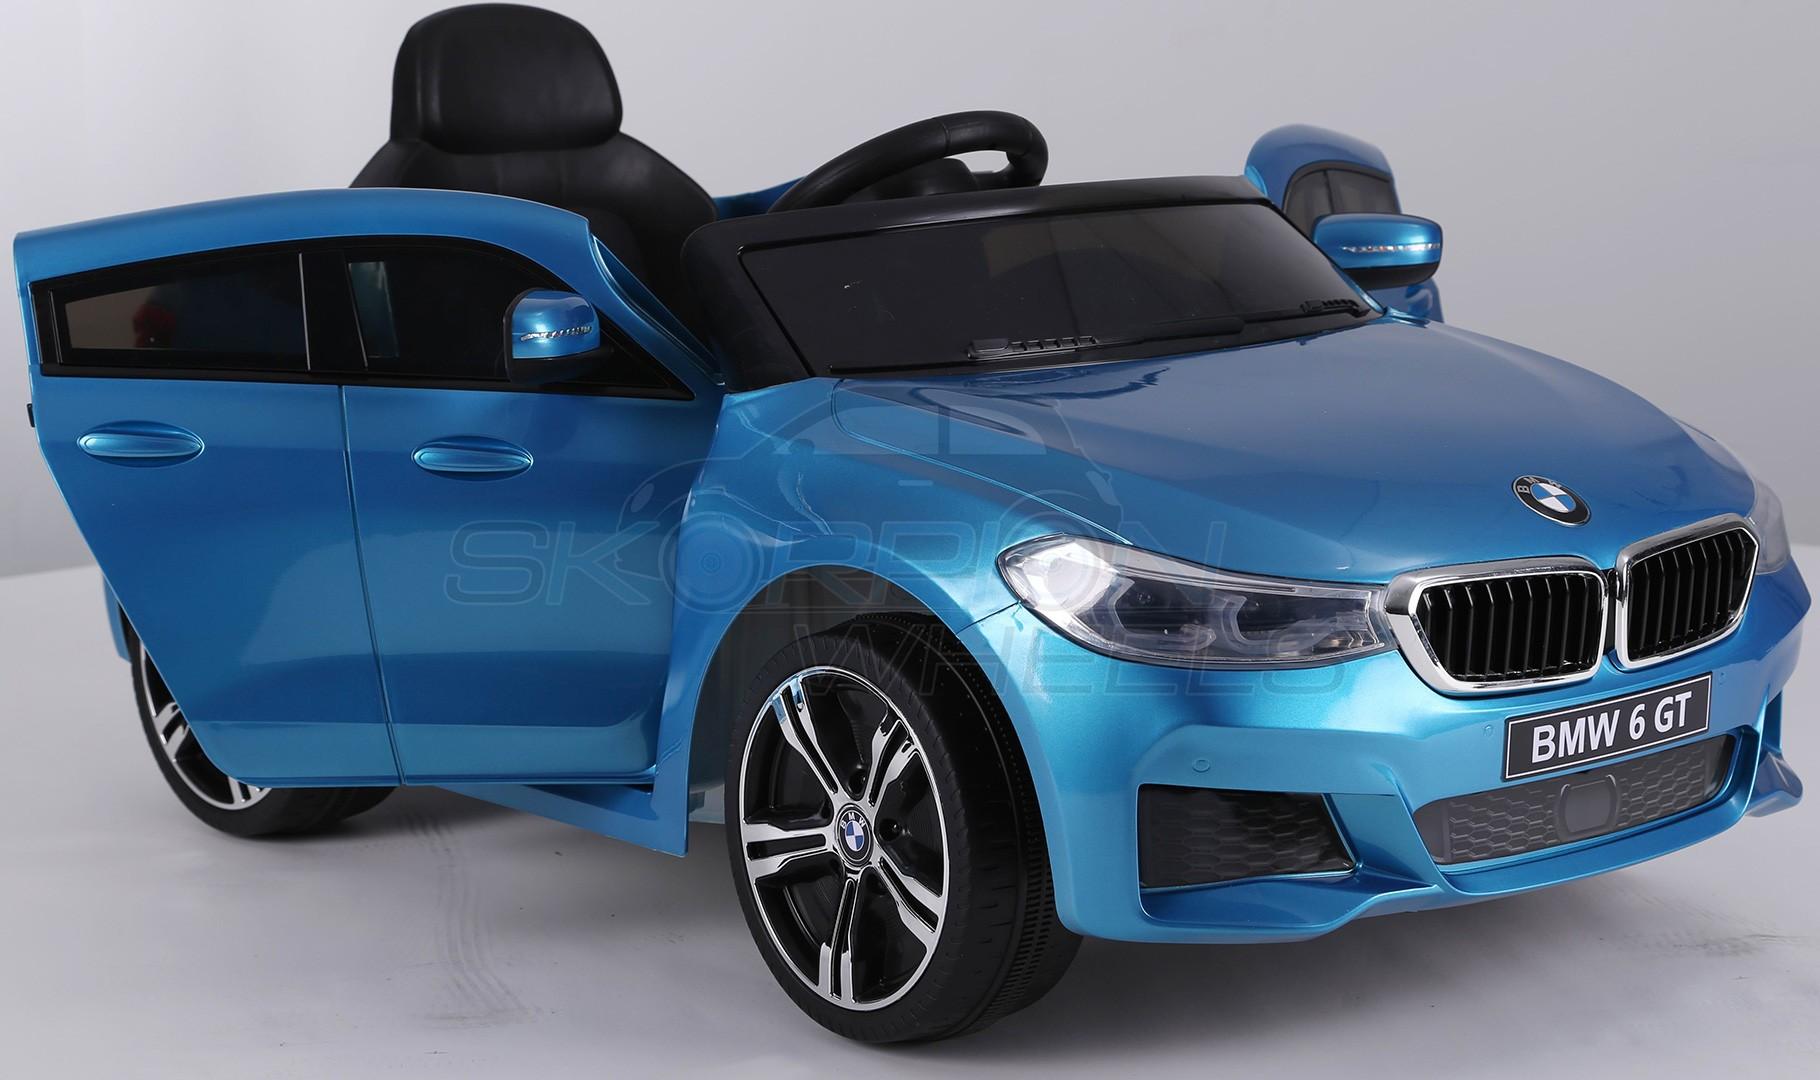 54b21ce4c58 ΗΛΕΚΤΡΟΚΙΝΗΤΟ BMW GT ORIGINAL 12V ΜΠΛΕ SKORPIONWHEELS - 5246064